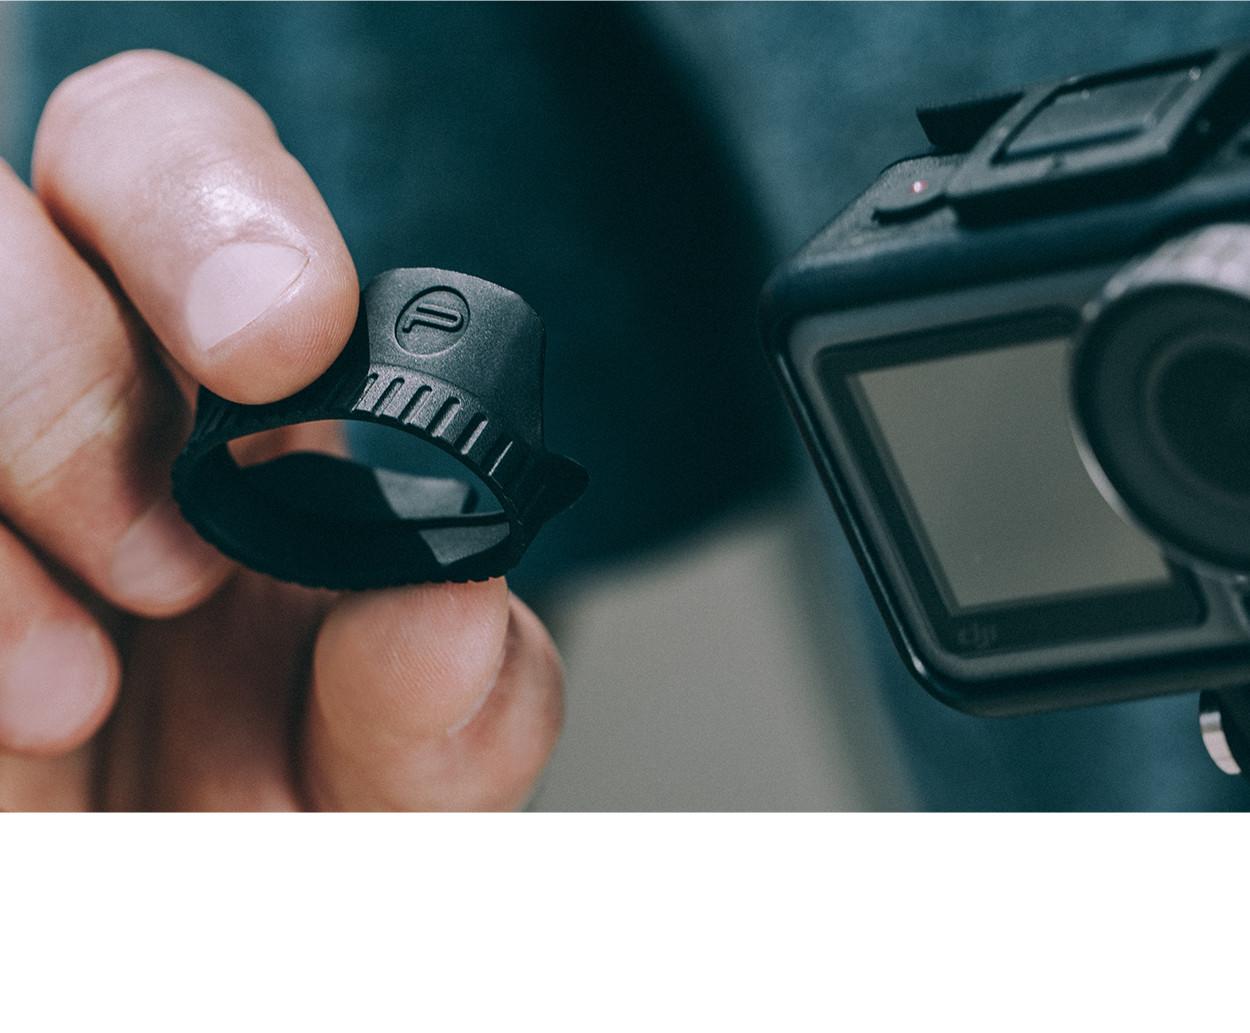 OSMO-ACTION镜头遮光罩-英文_04.jpg